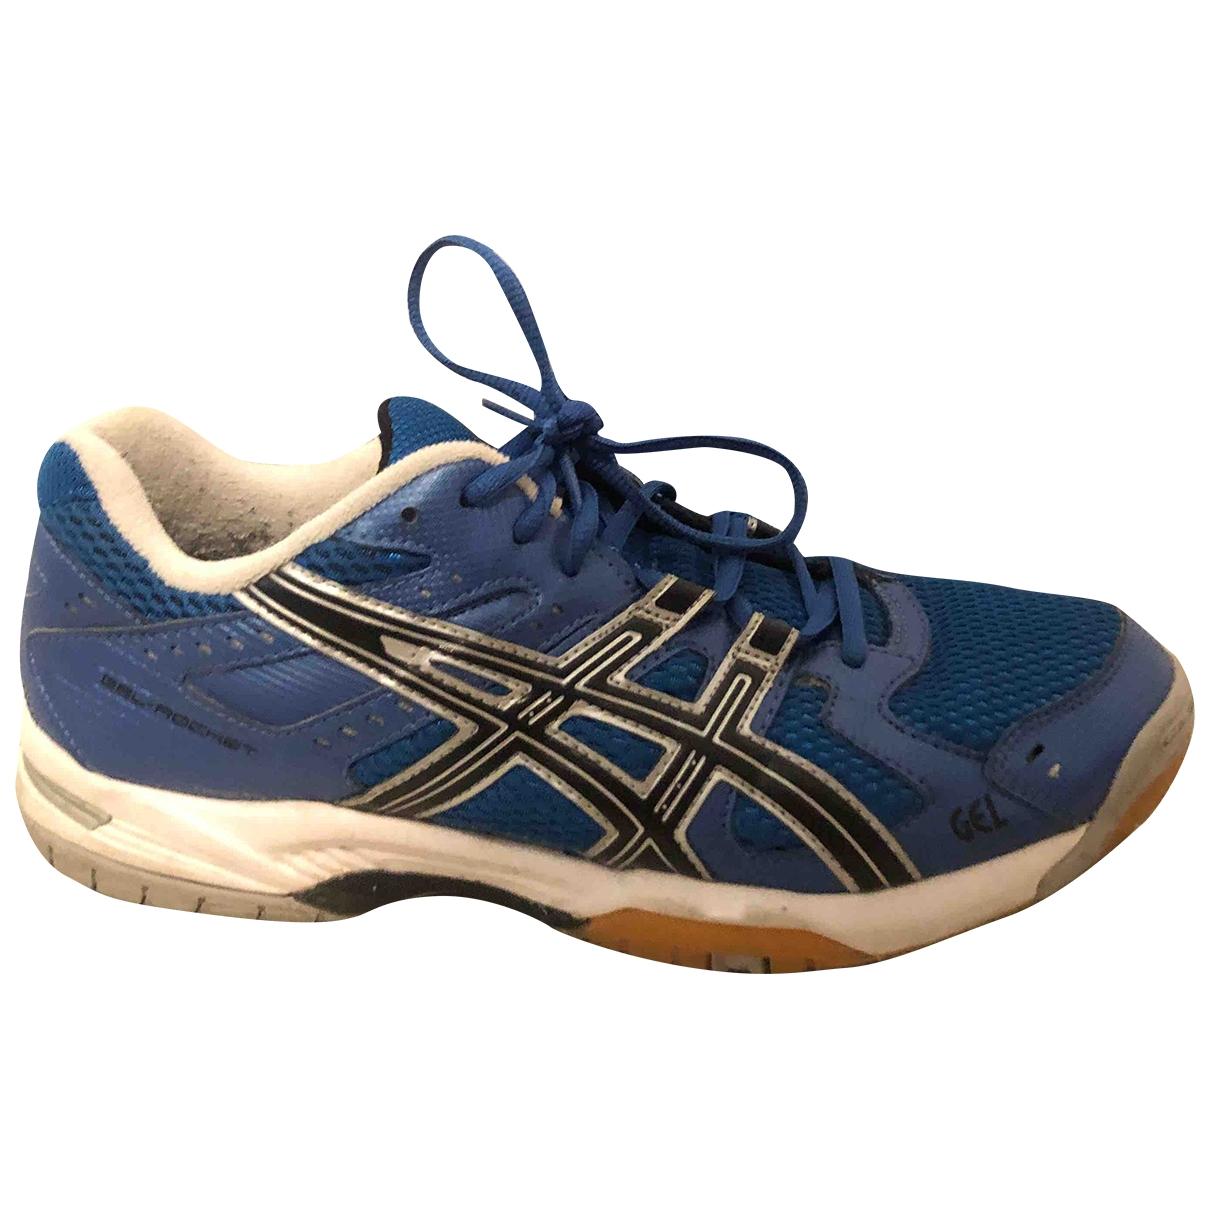 Asics \N Sneakers in  Blau Kautschuk